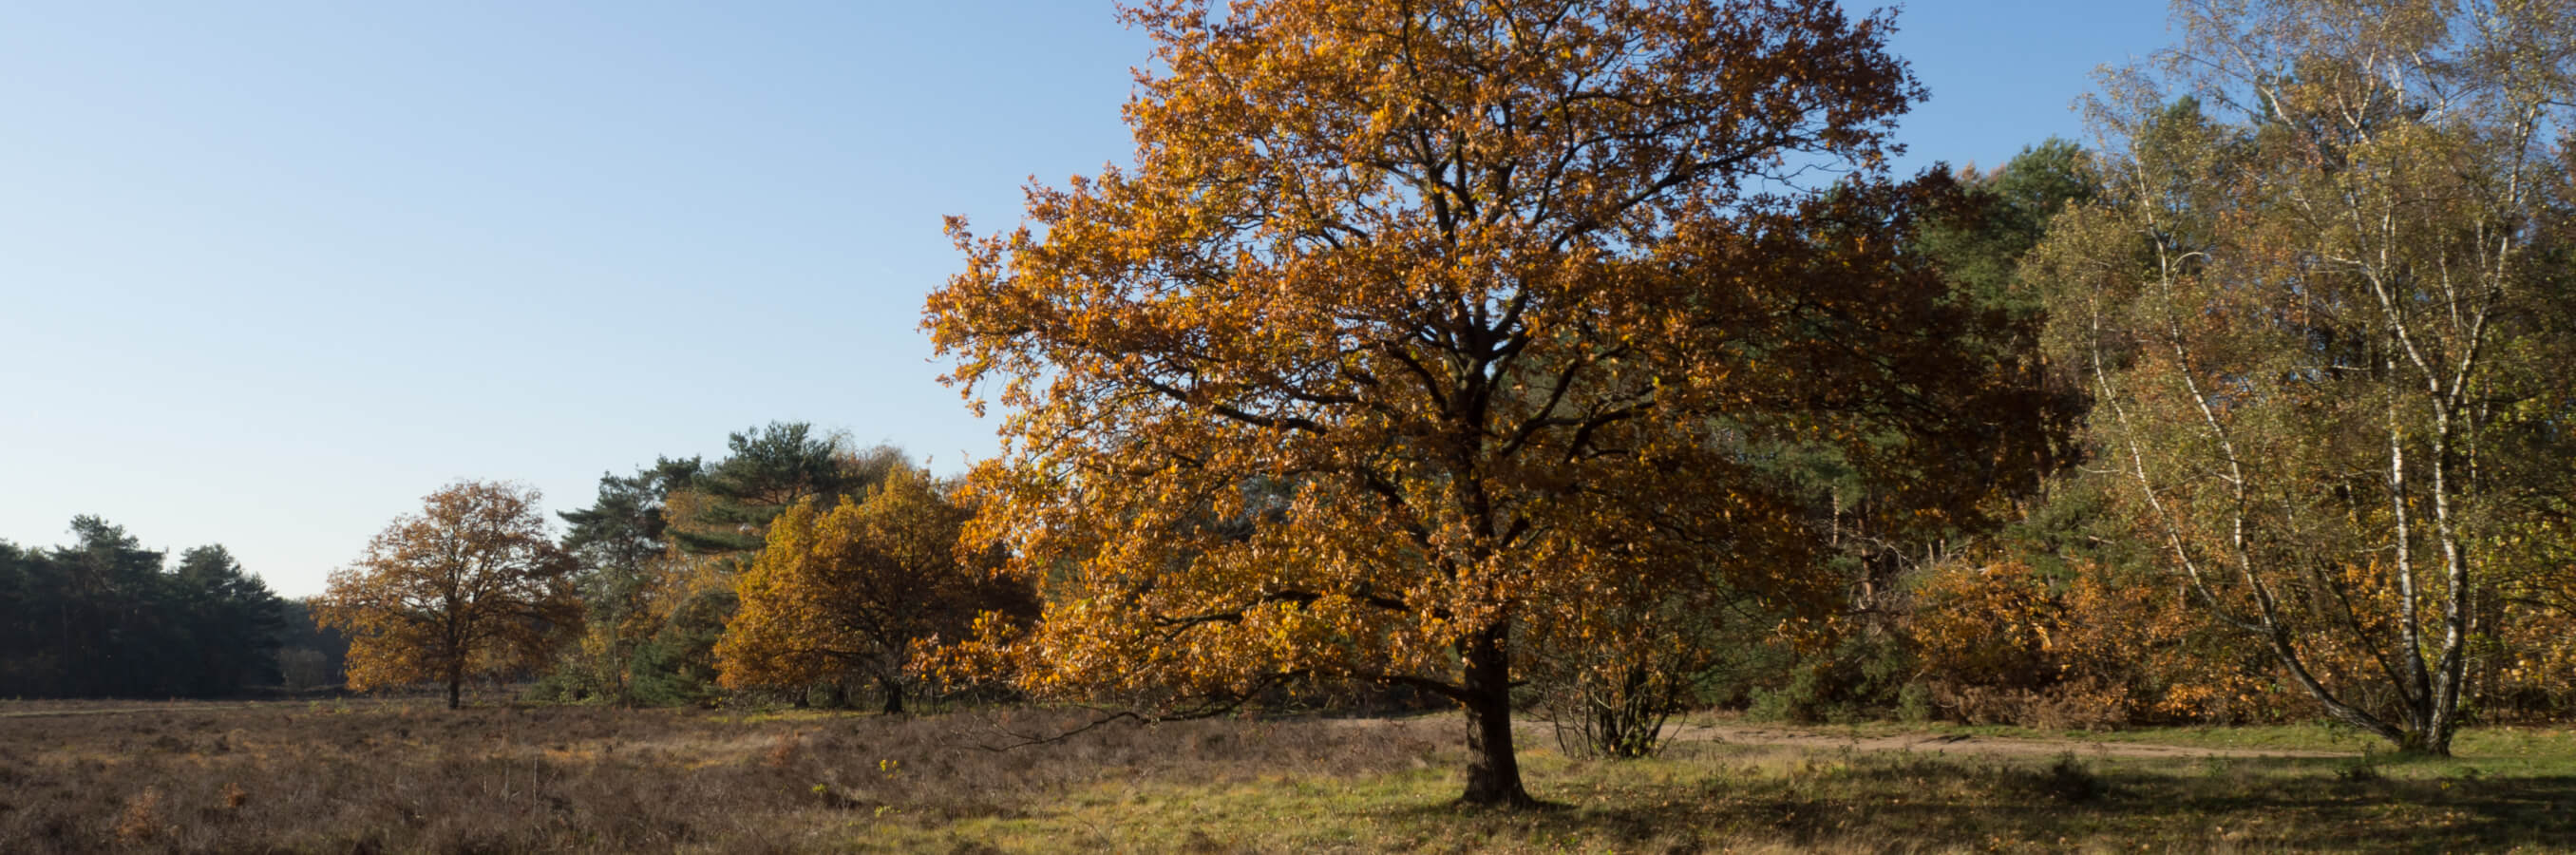 Heide Bussum herfst nabij locatie mindfulness training